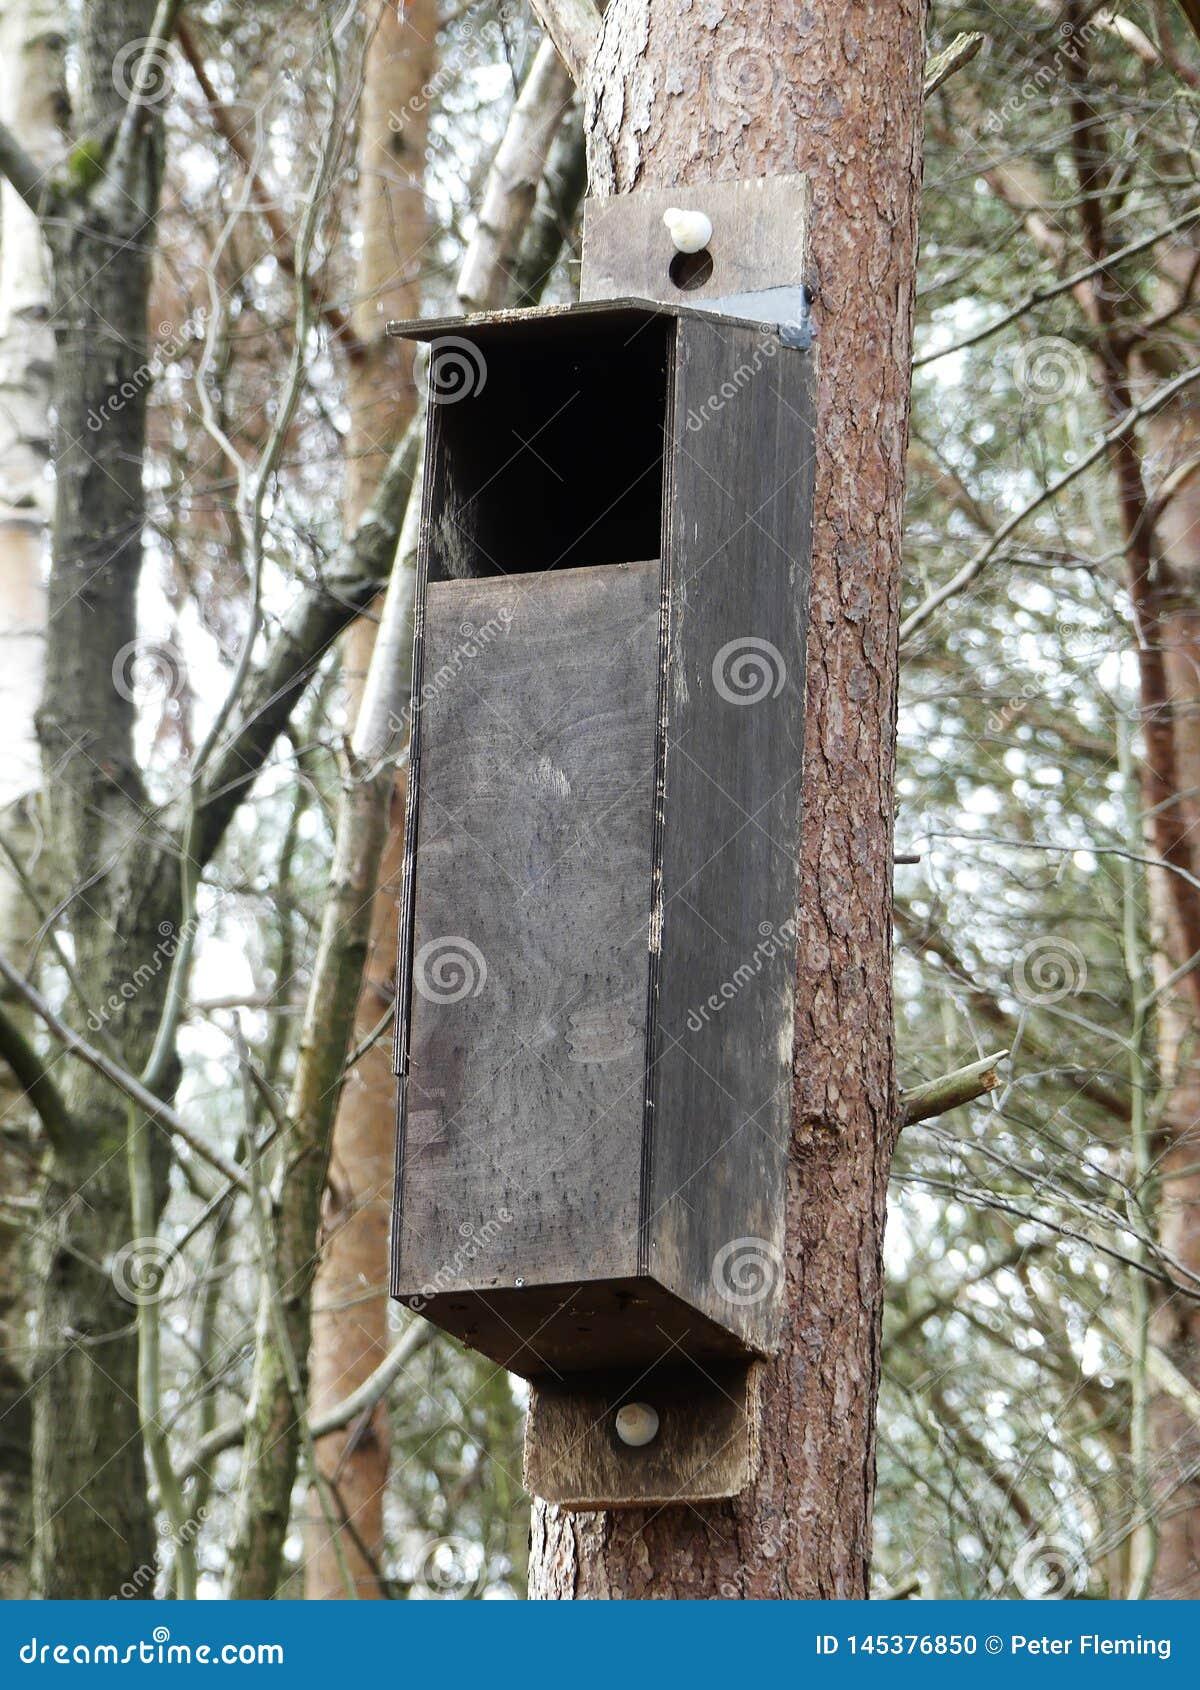 Nido per deporre le uova per i gufi in terreno boscoso